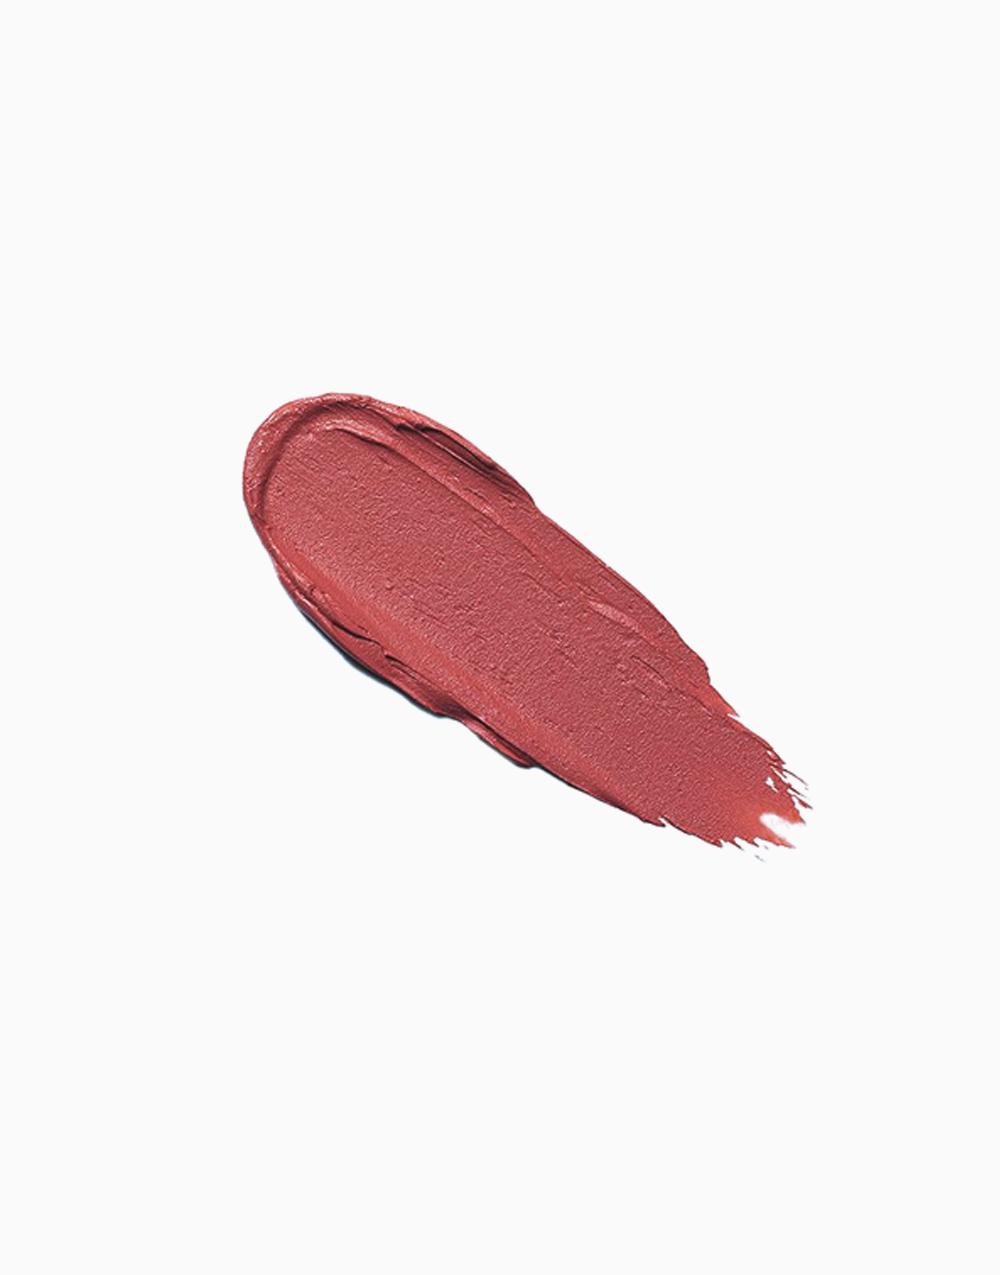 Zero Gram Matte Lipstick by Rom&nd | DUSTY PINK